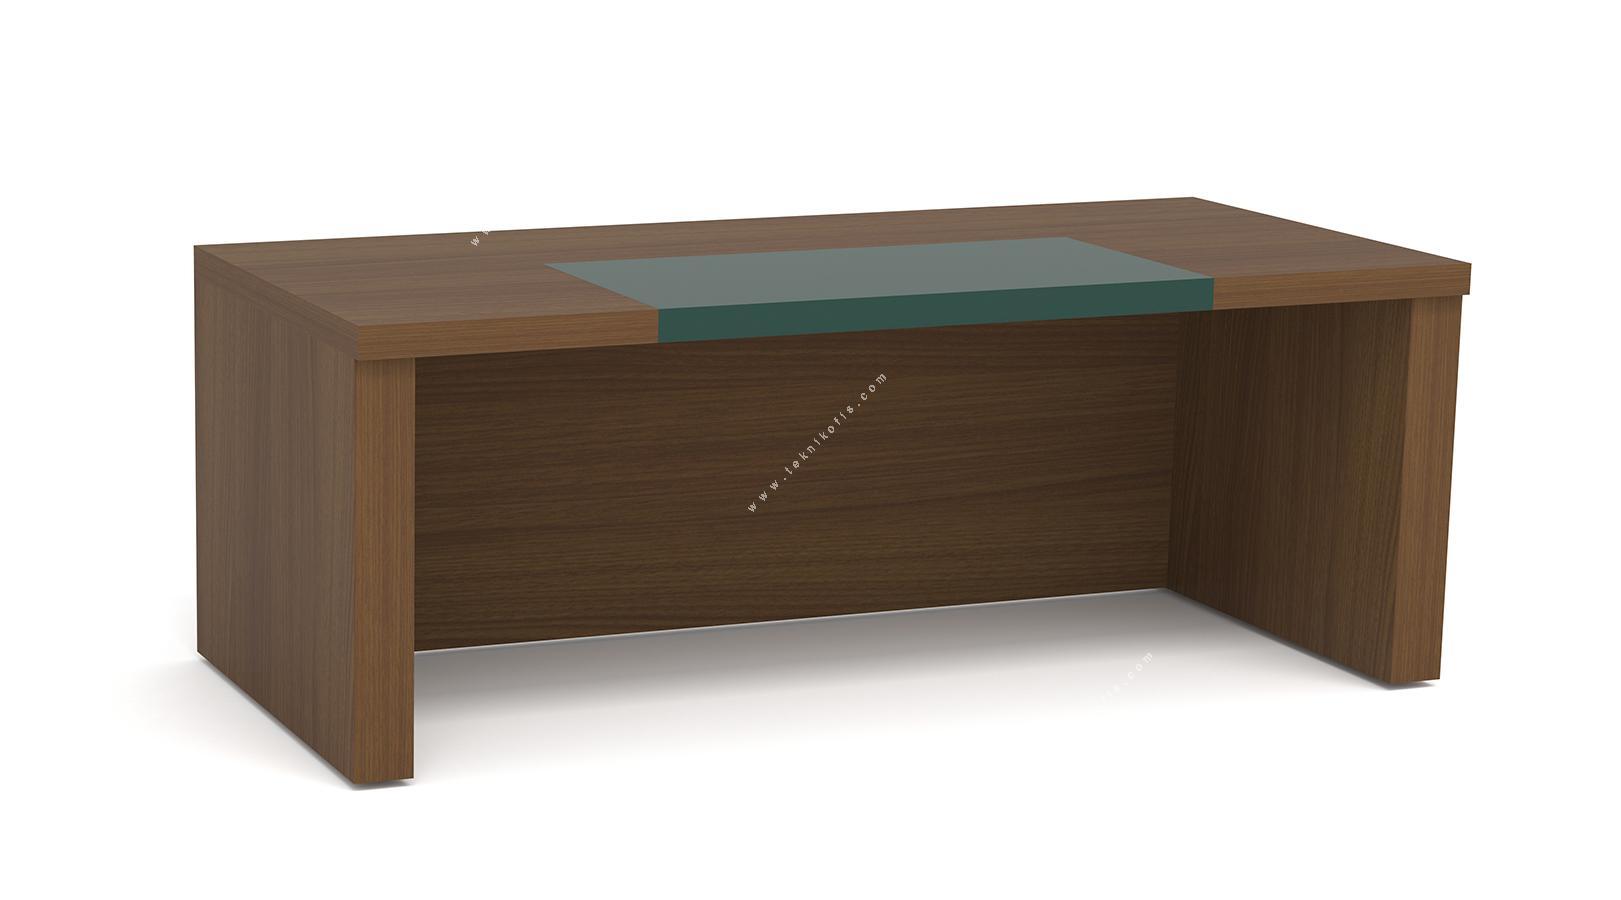 ranses makam masası 220cm